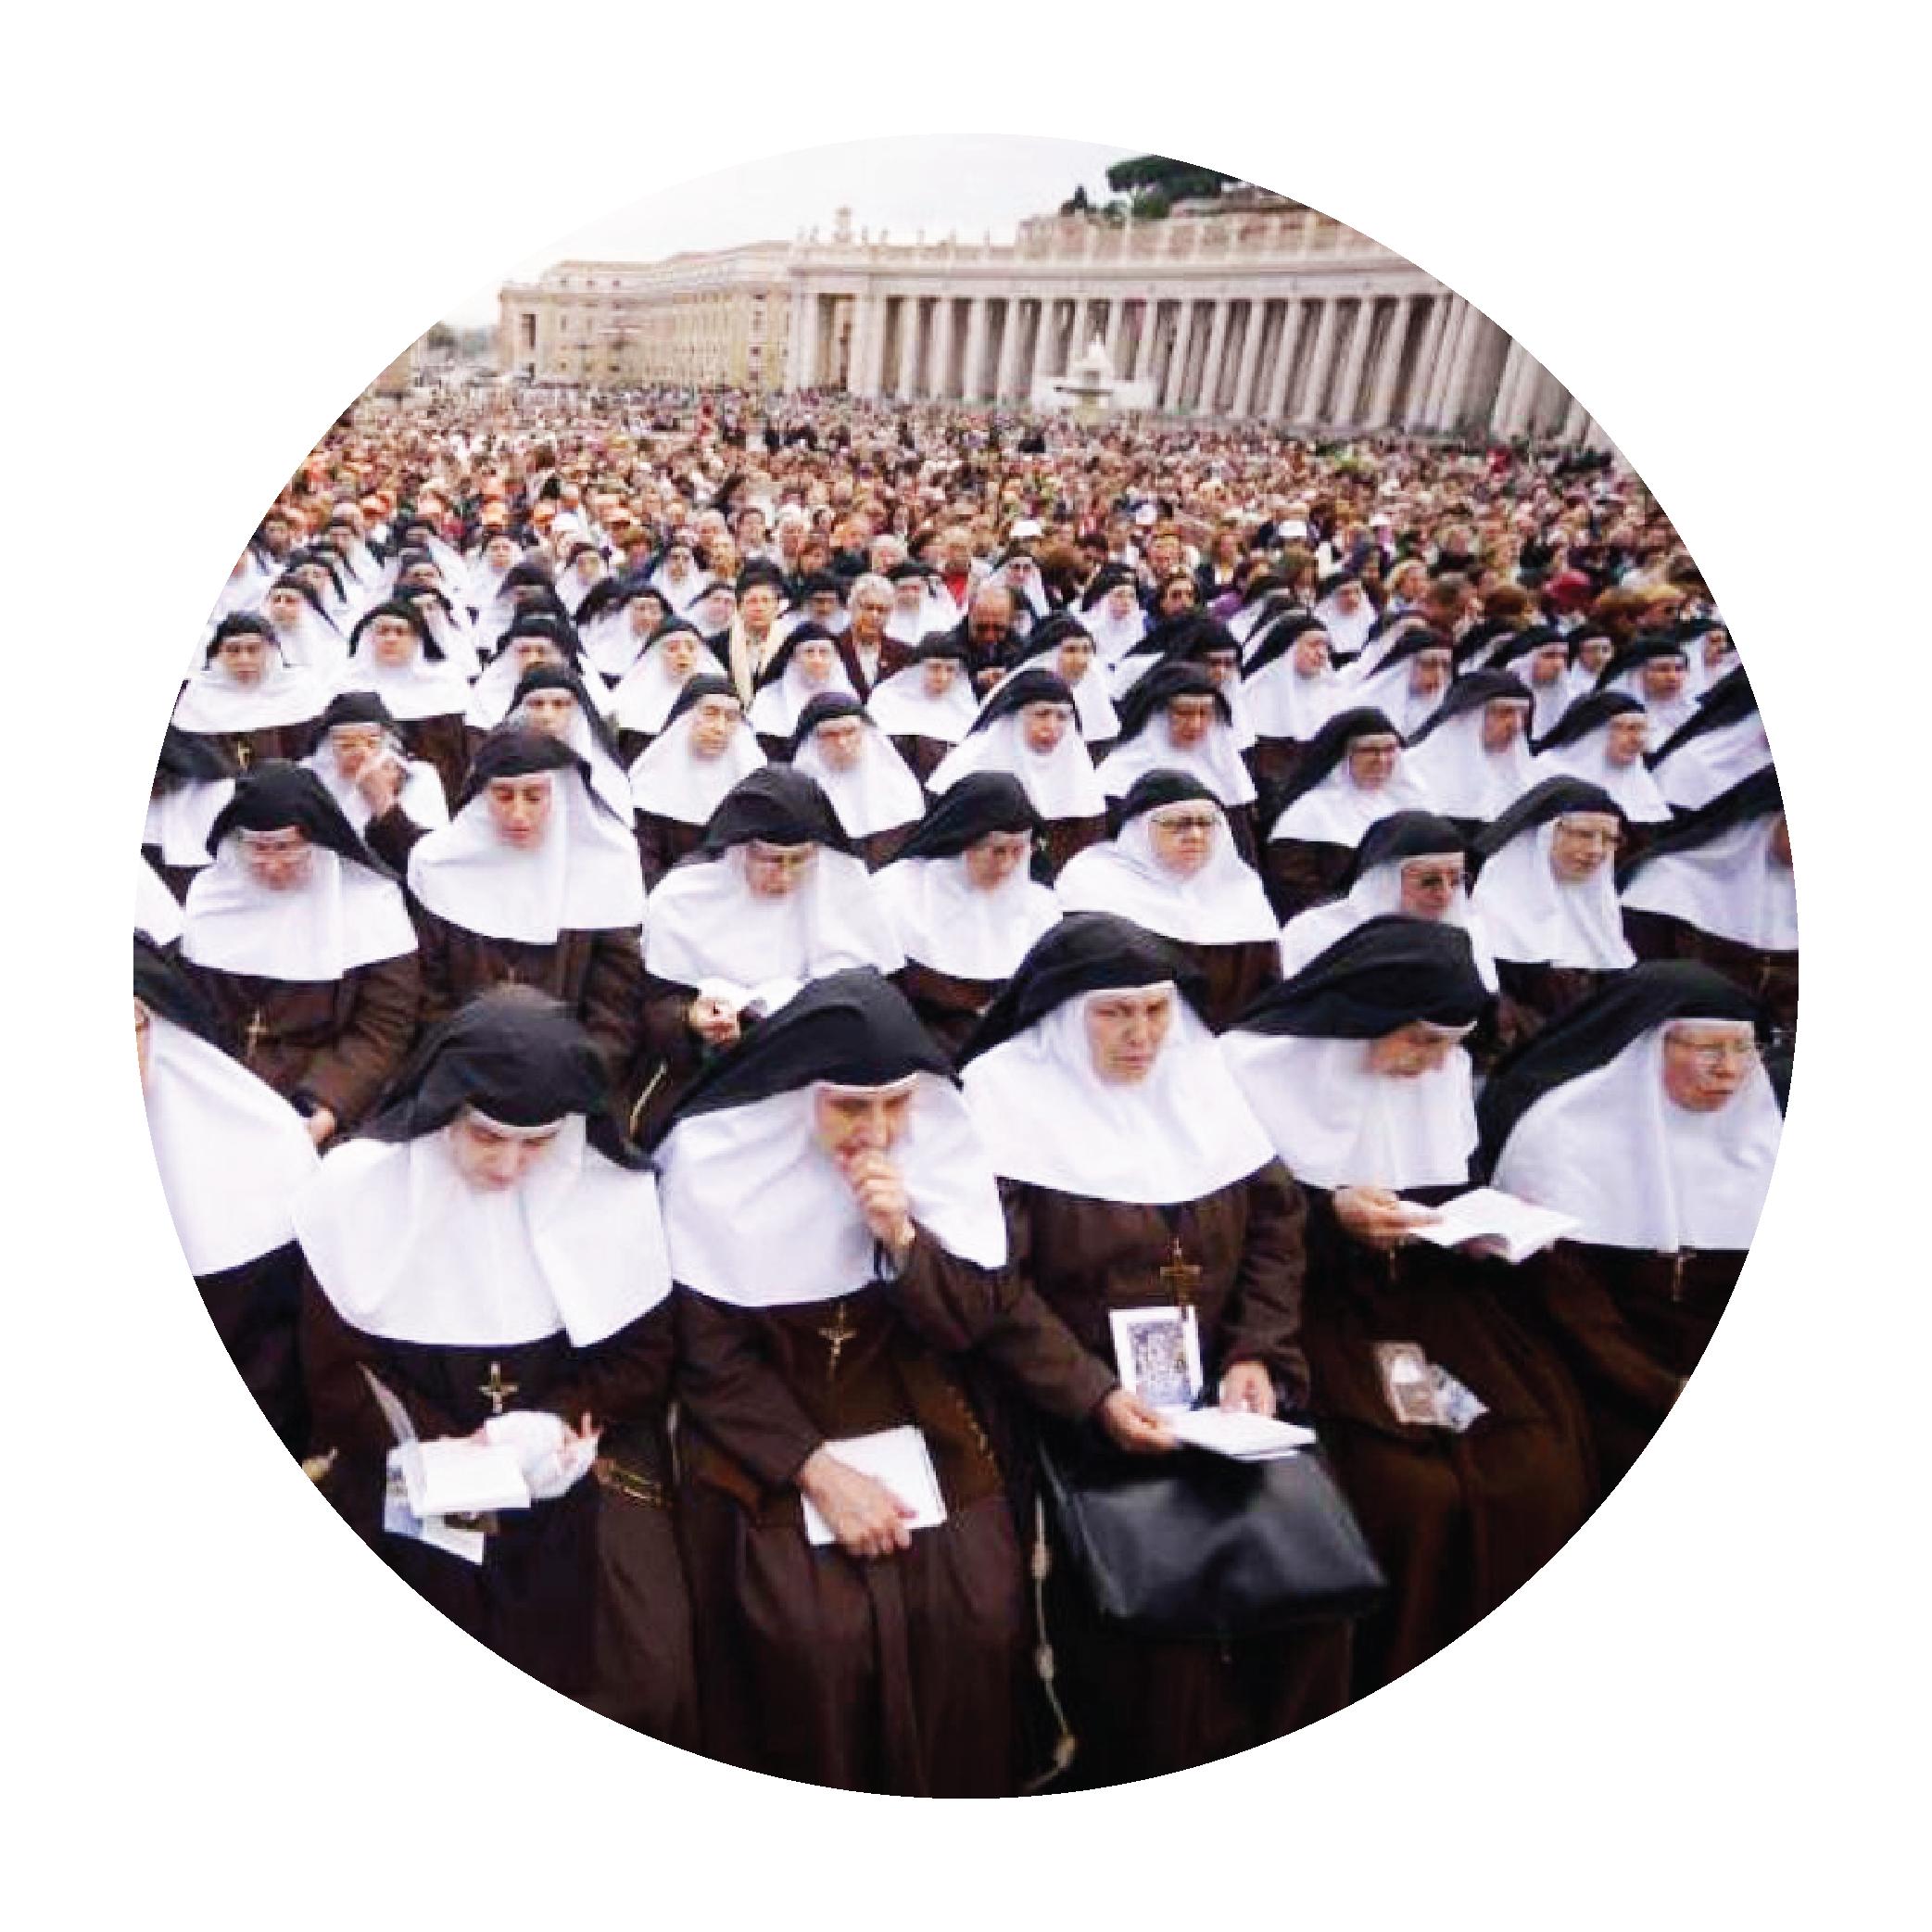 VIAGGI SPIRITUALI/RELIGIOSI